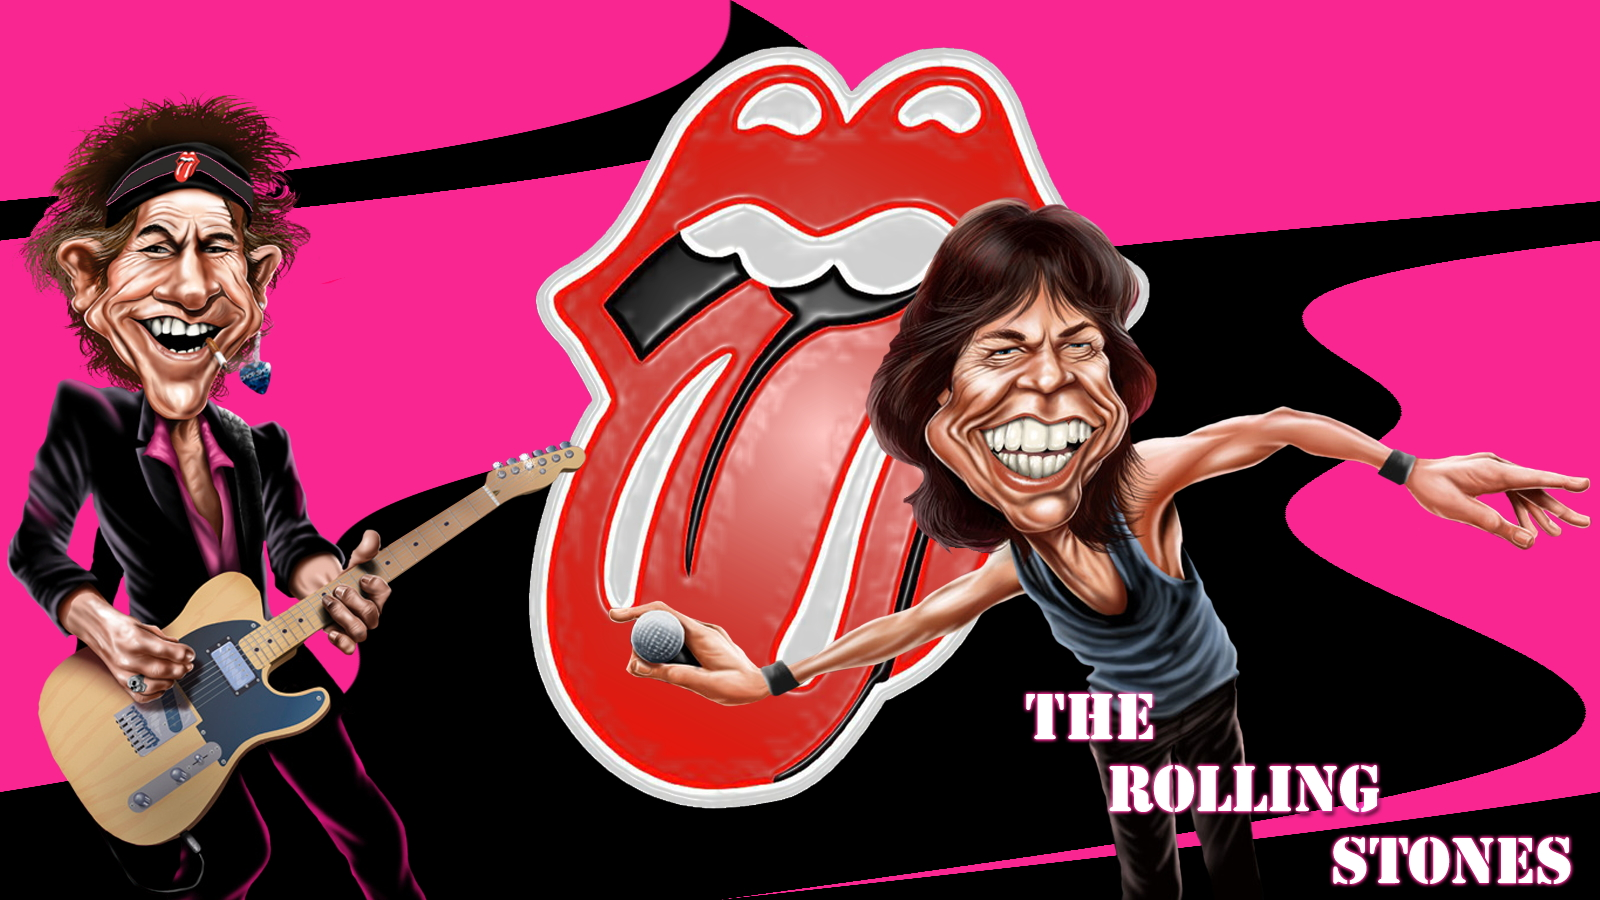 Rolling Stones Wallpaper wallpaper   ForWallpapercom 1600x900